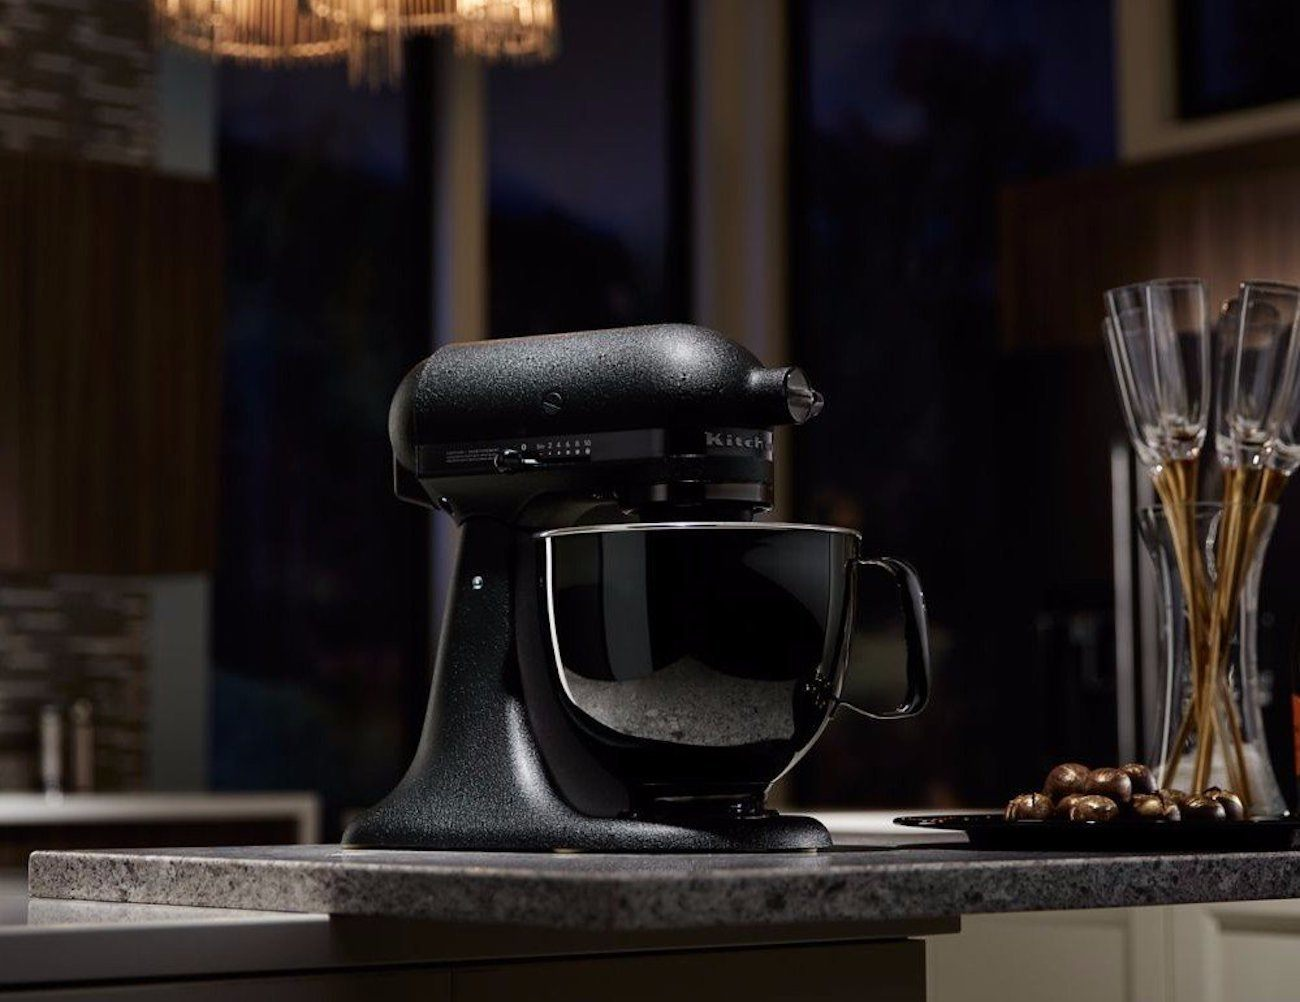 kitchenaid artisan black tie mixer review the gadget flow. Black Bedroom Furniture Sets. Home Design Ideas